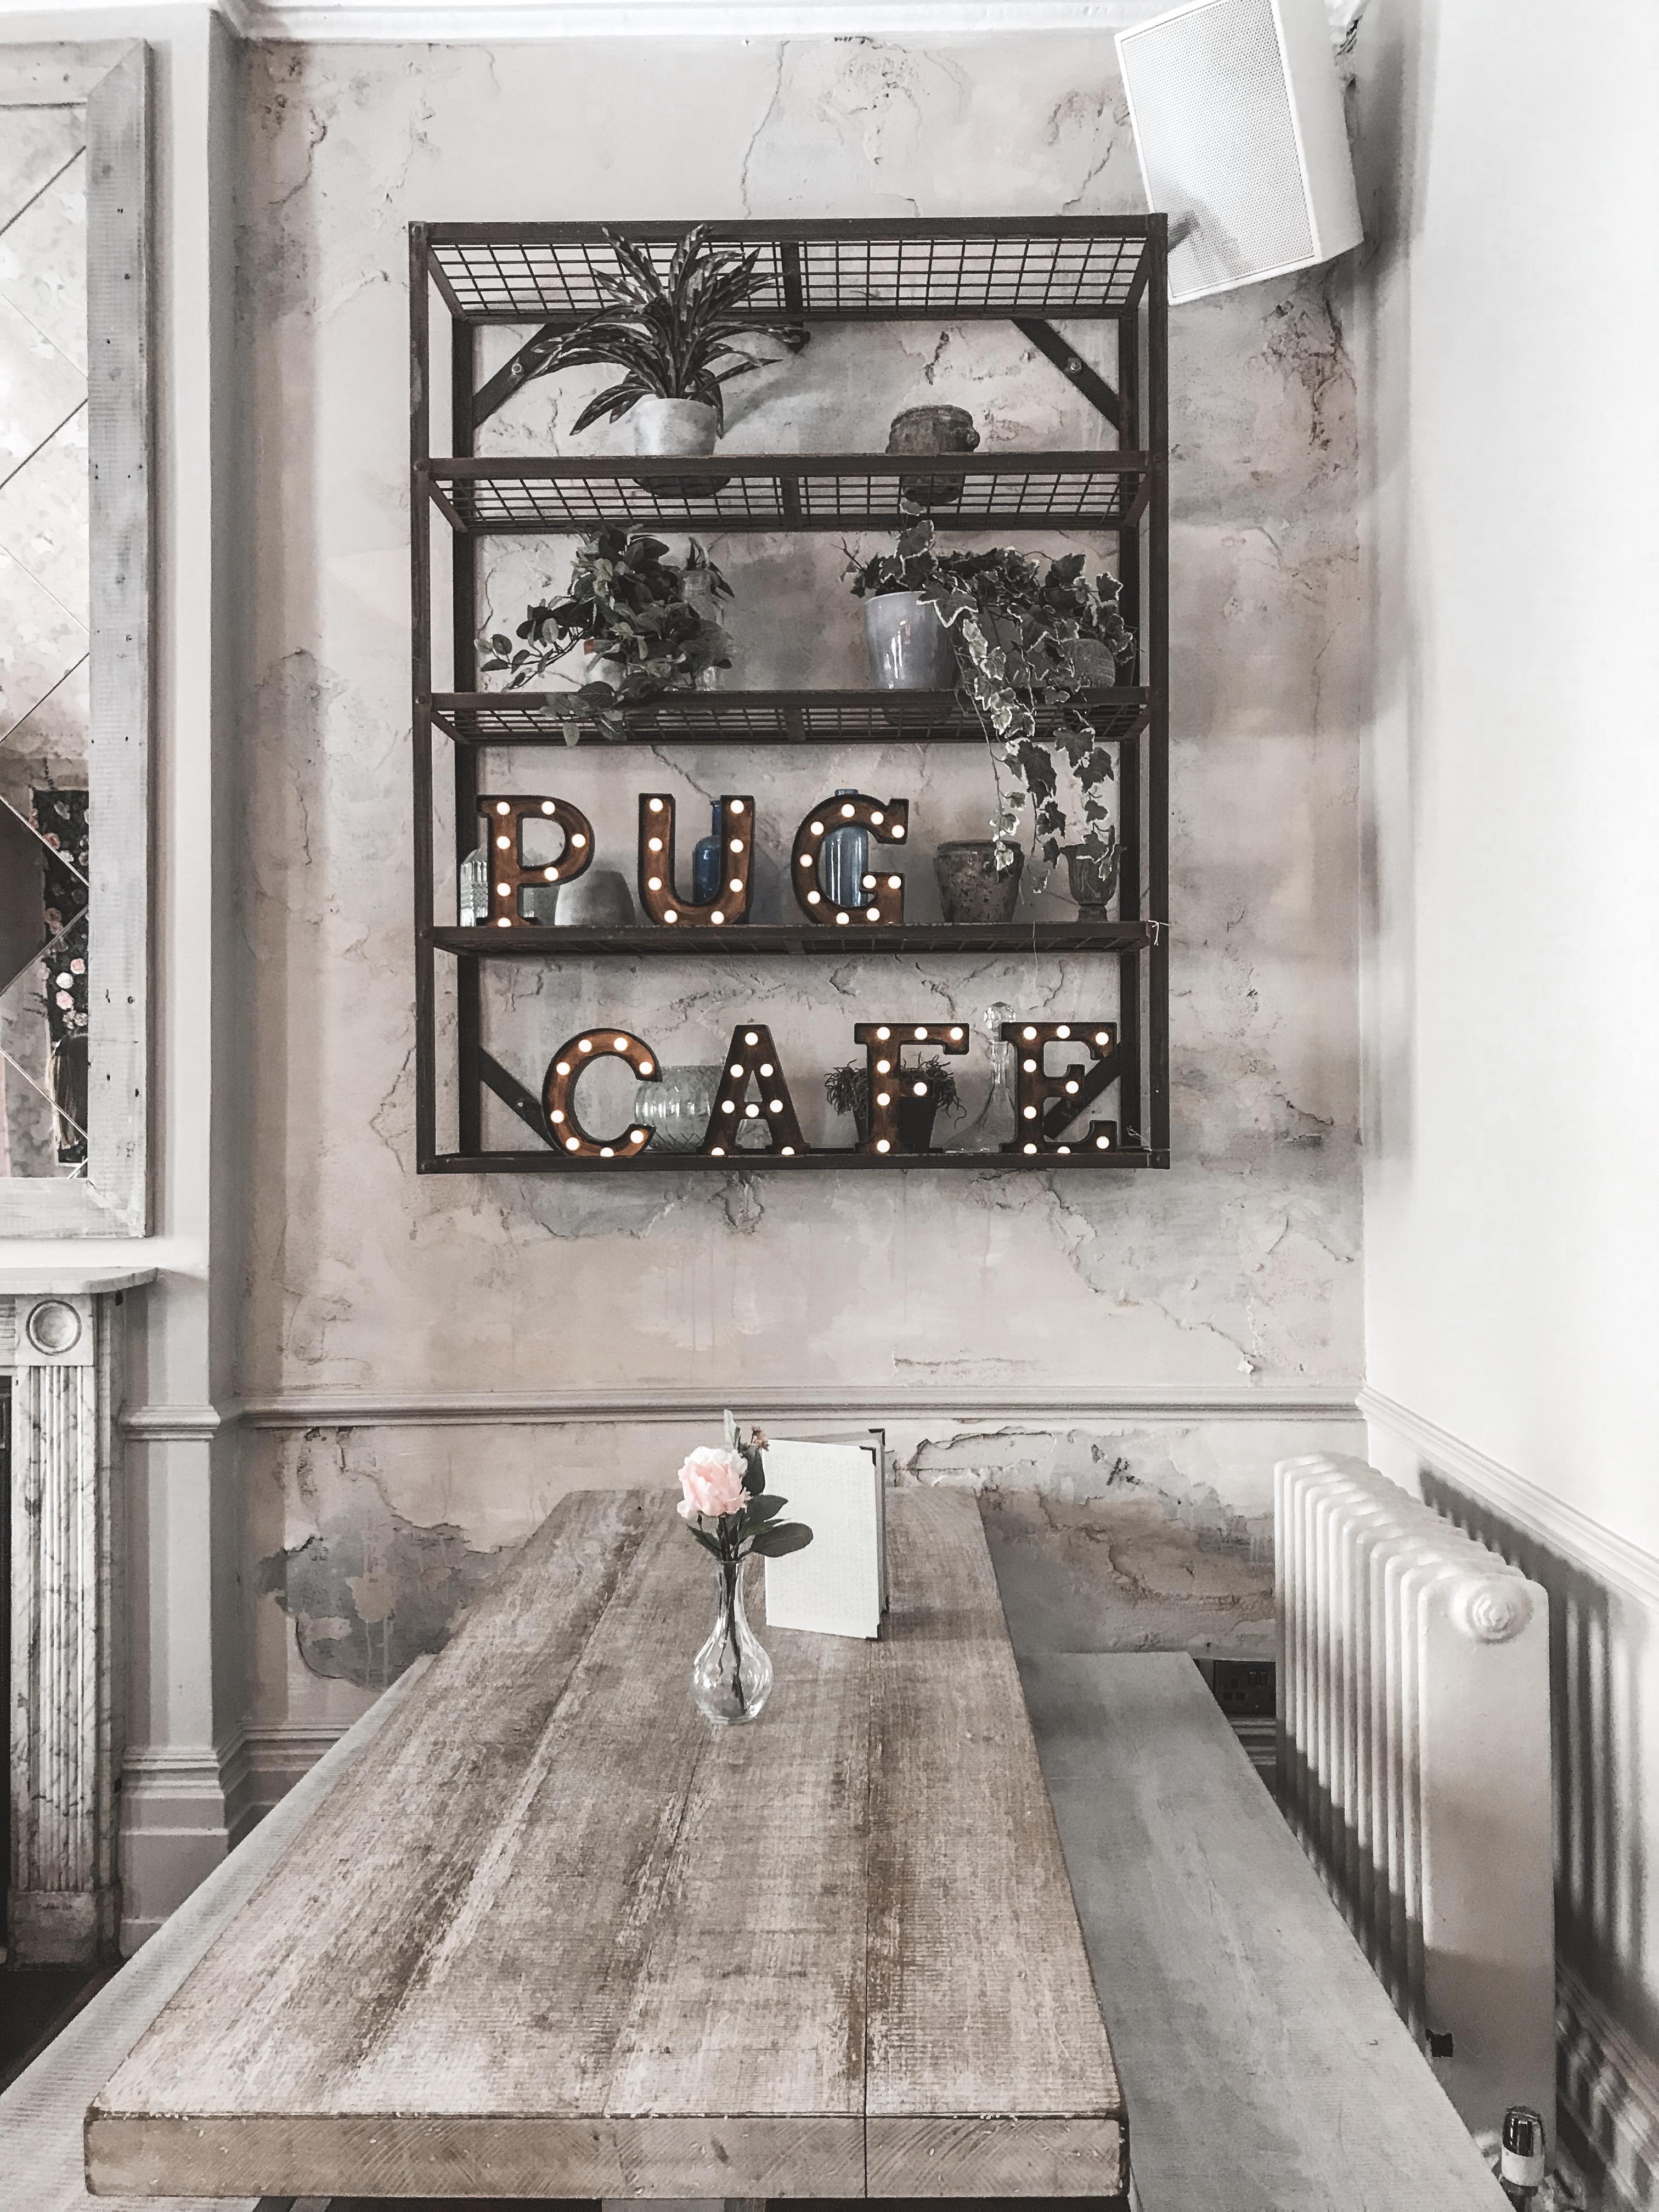 Pug Cafe Bristol